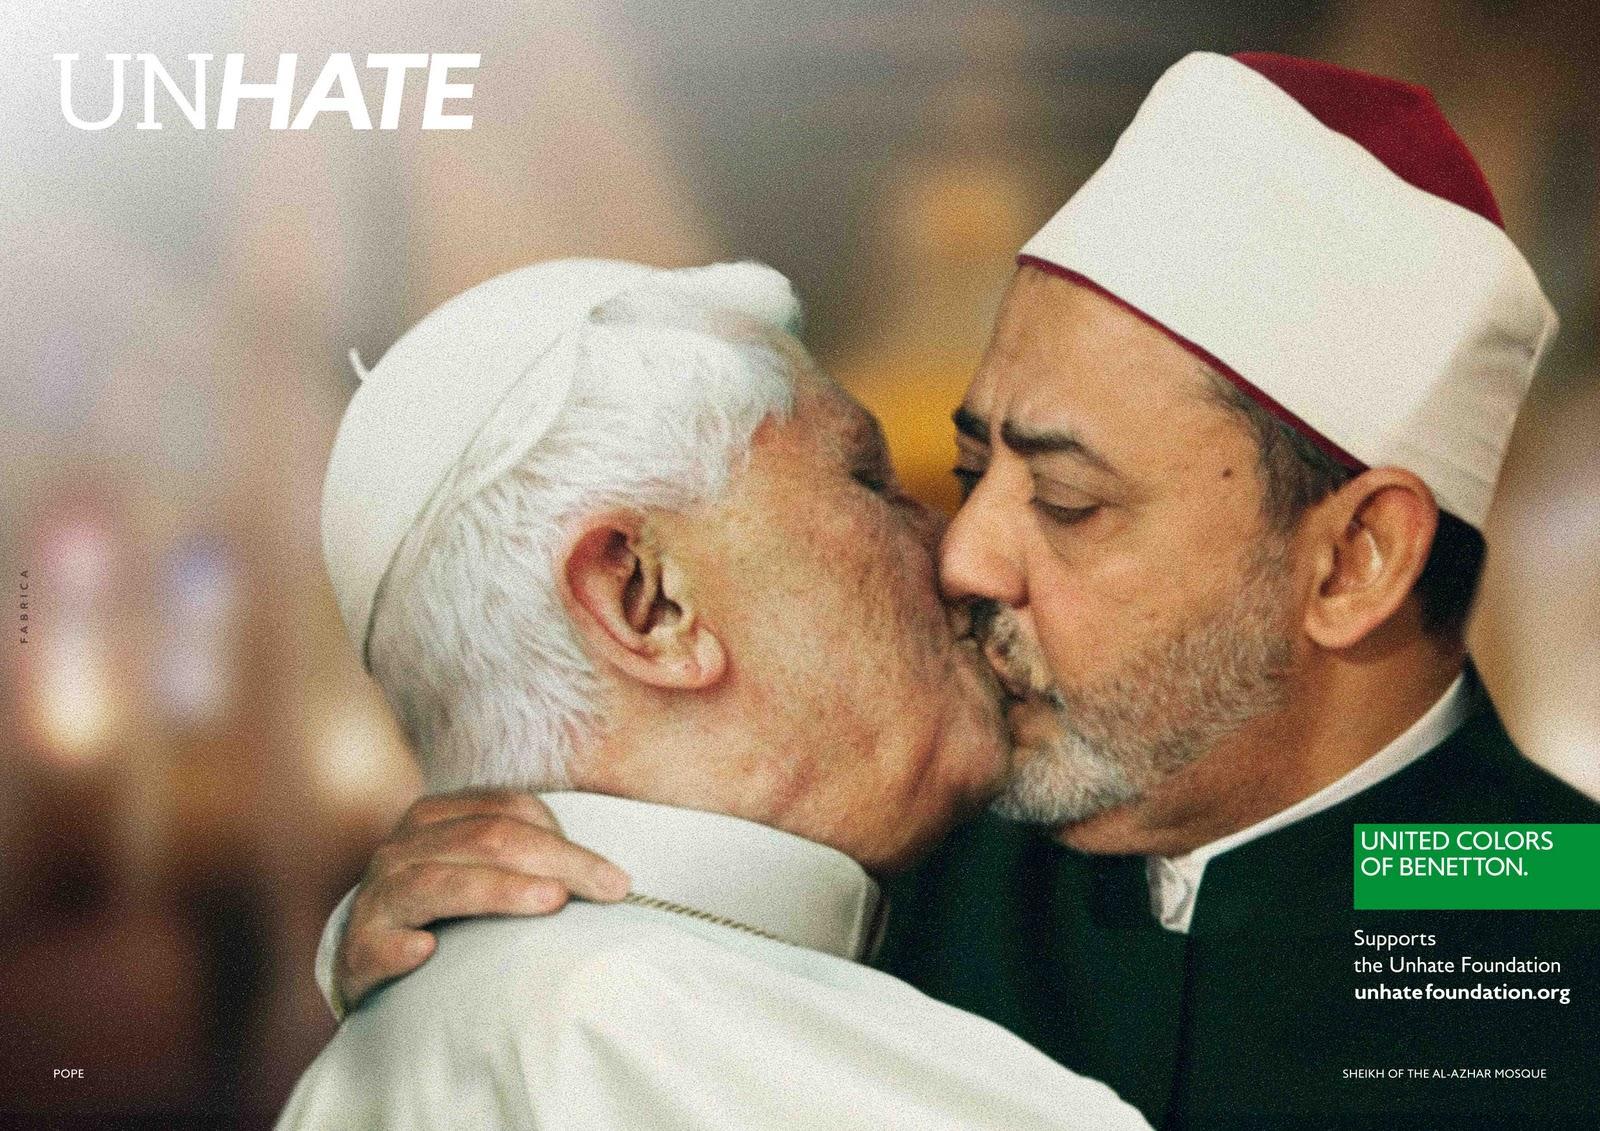 Benetton_Unhate_POPE_AL_TAYEB_DPS